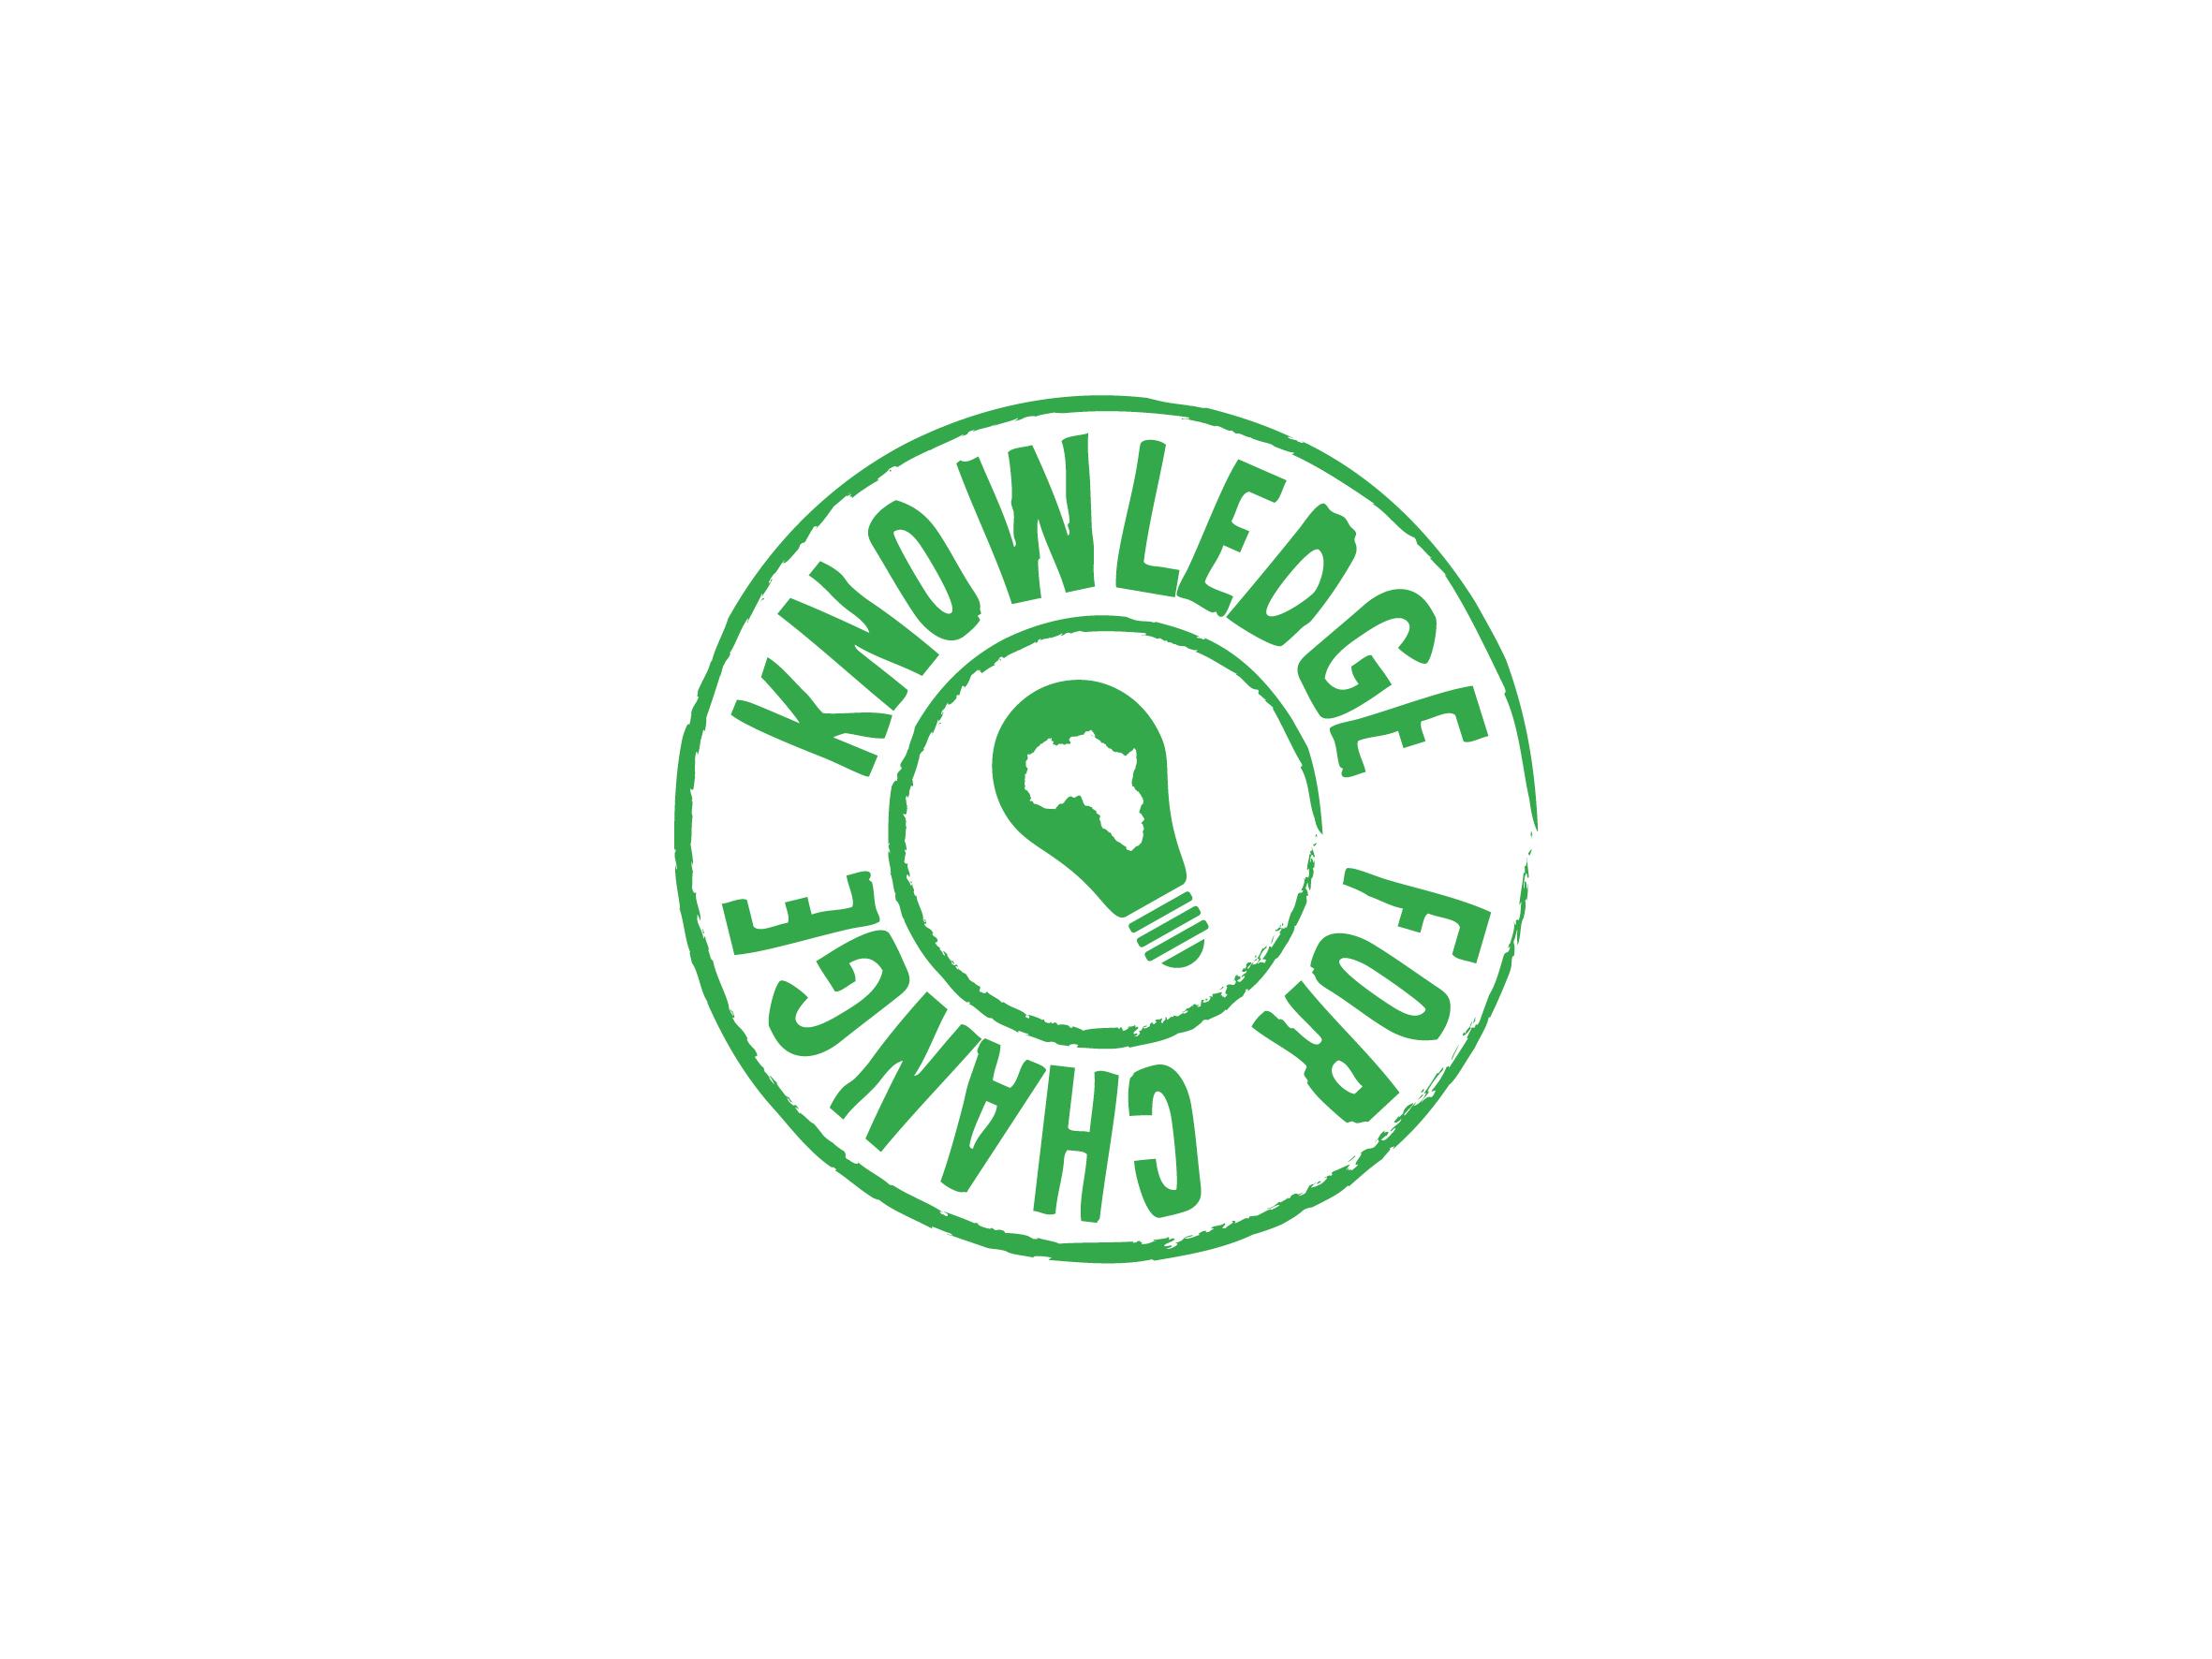 knowledge for change logo design designed by Dakini Design Saltaire, Shipley, Bradford